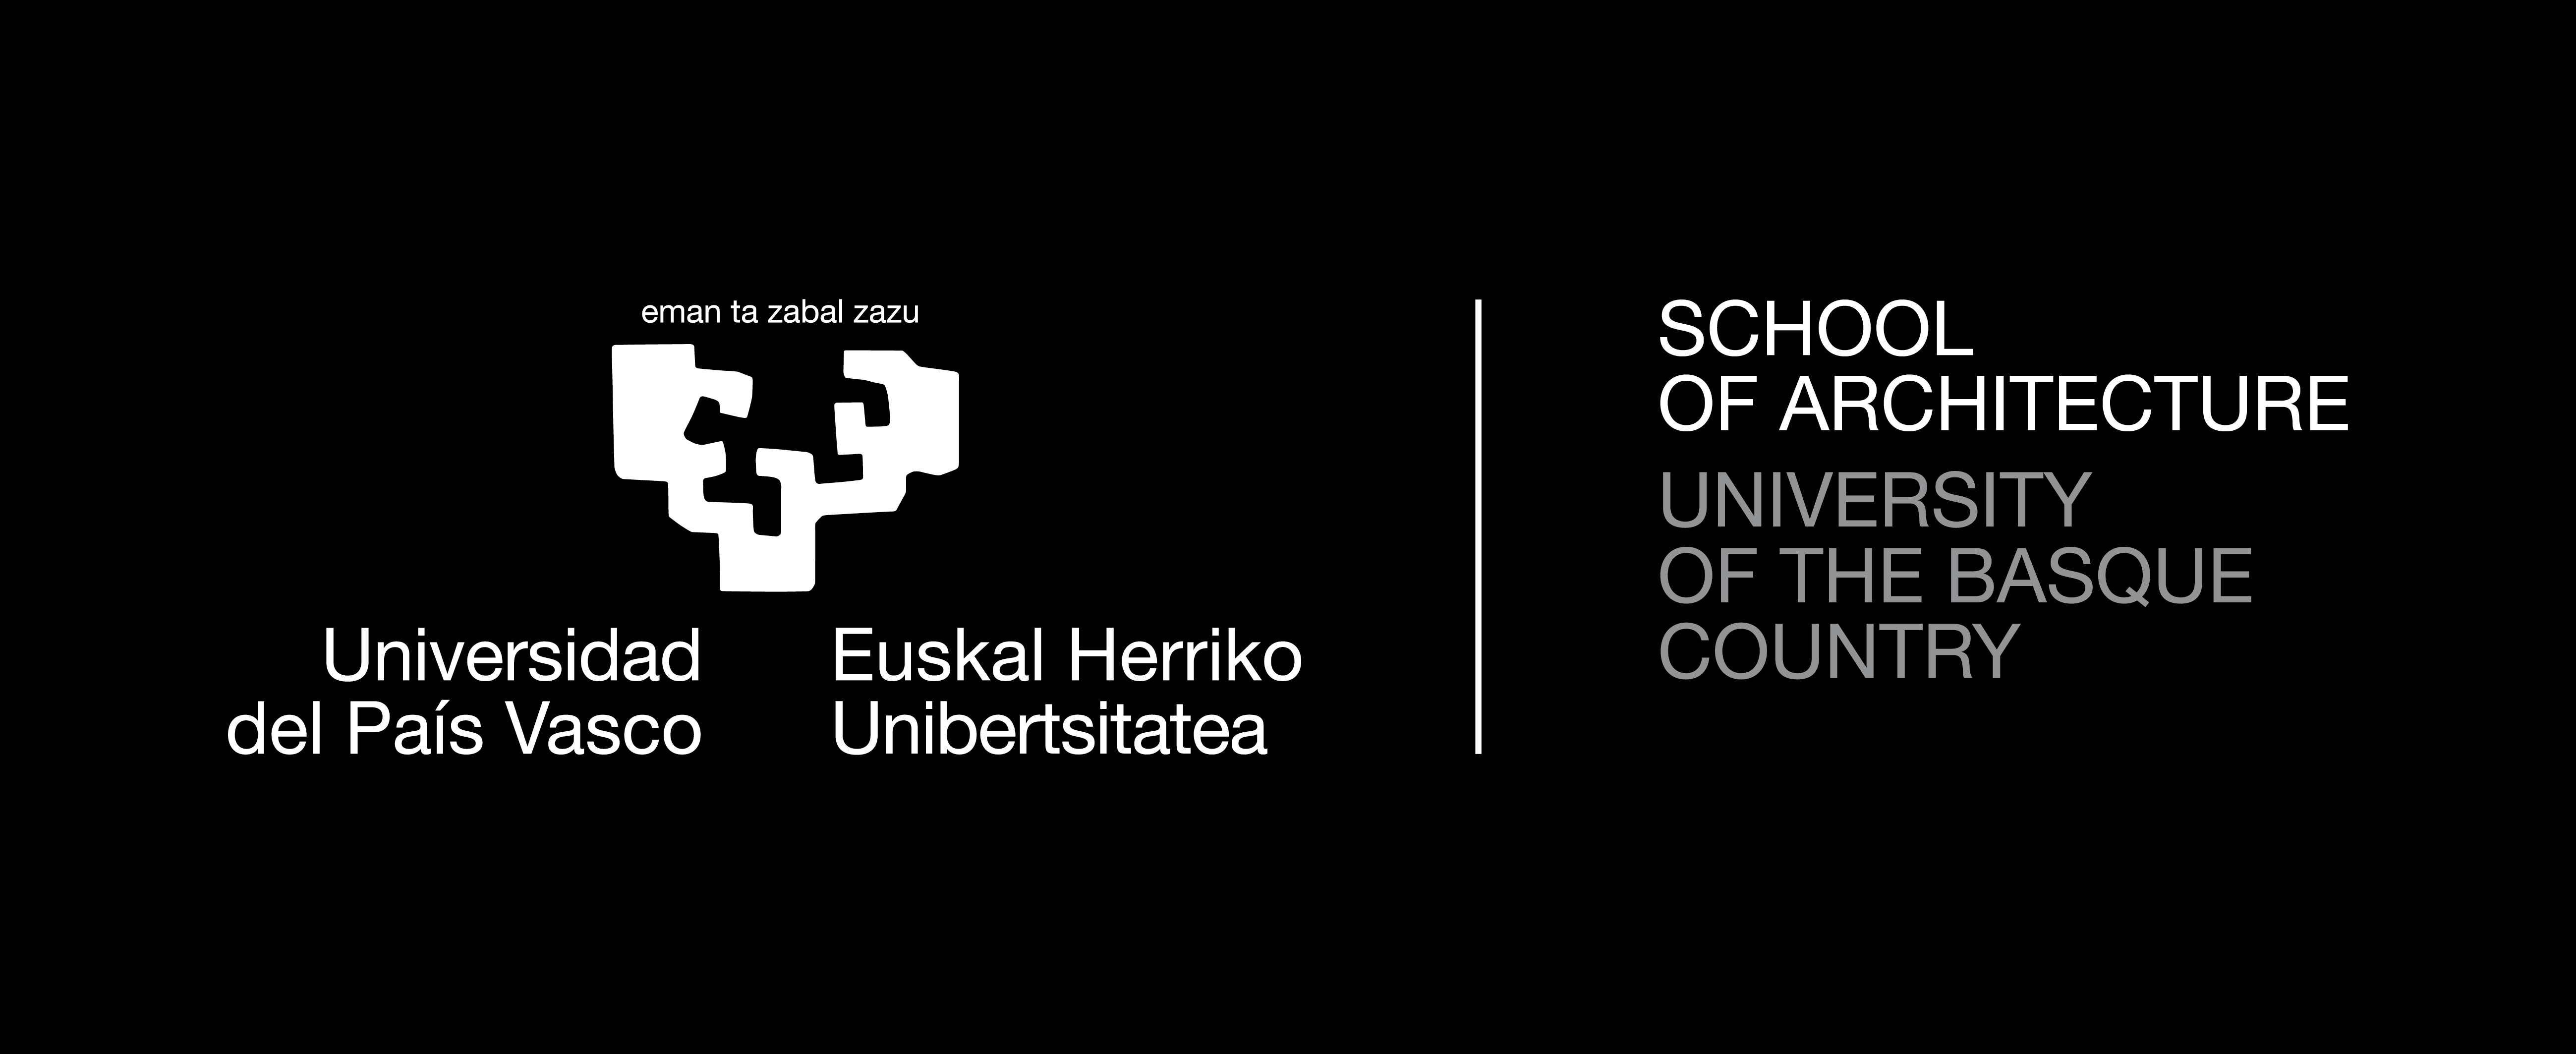 Calendario Etsa Upv.Imagen Corporativa Escuela Tecnica Superior De Arquitectura Upv Ehu